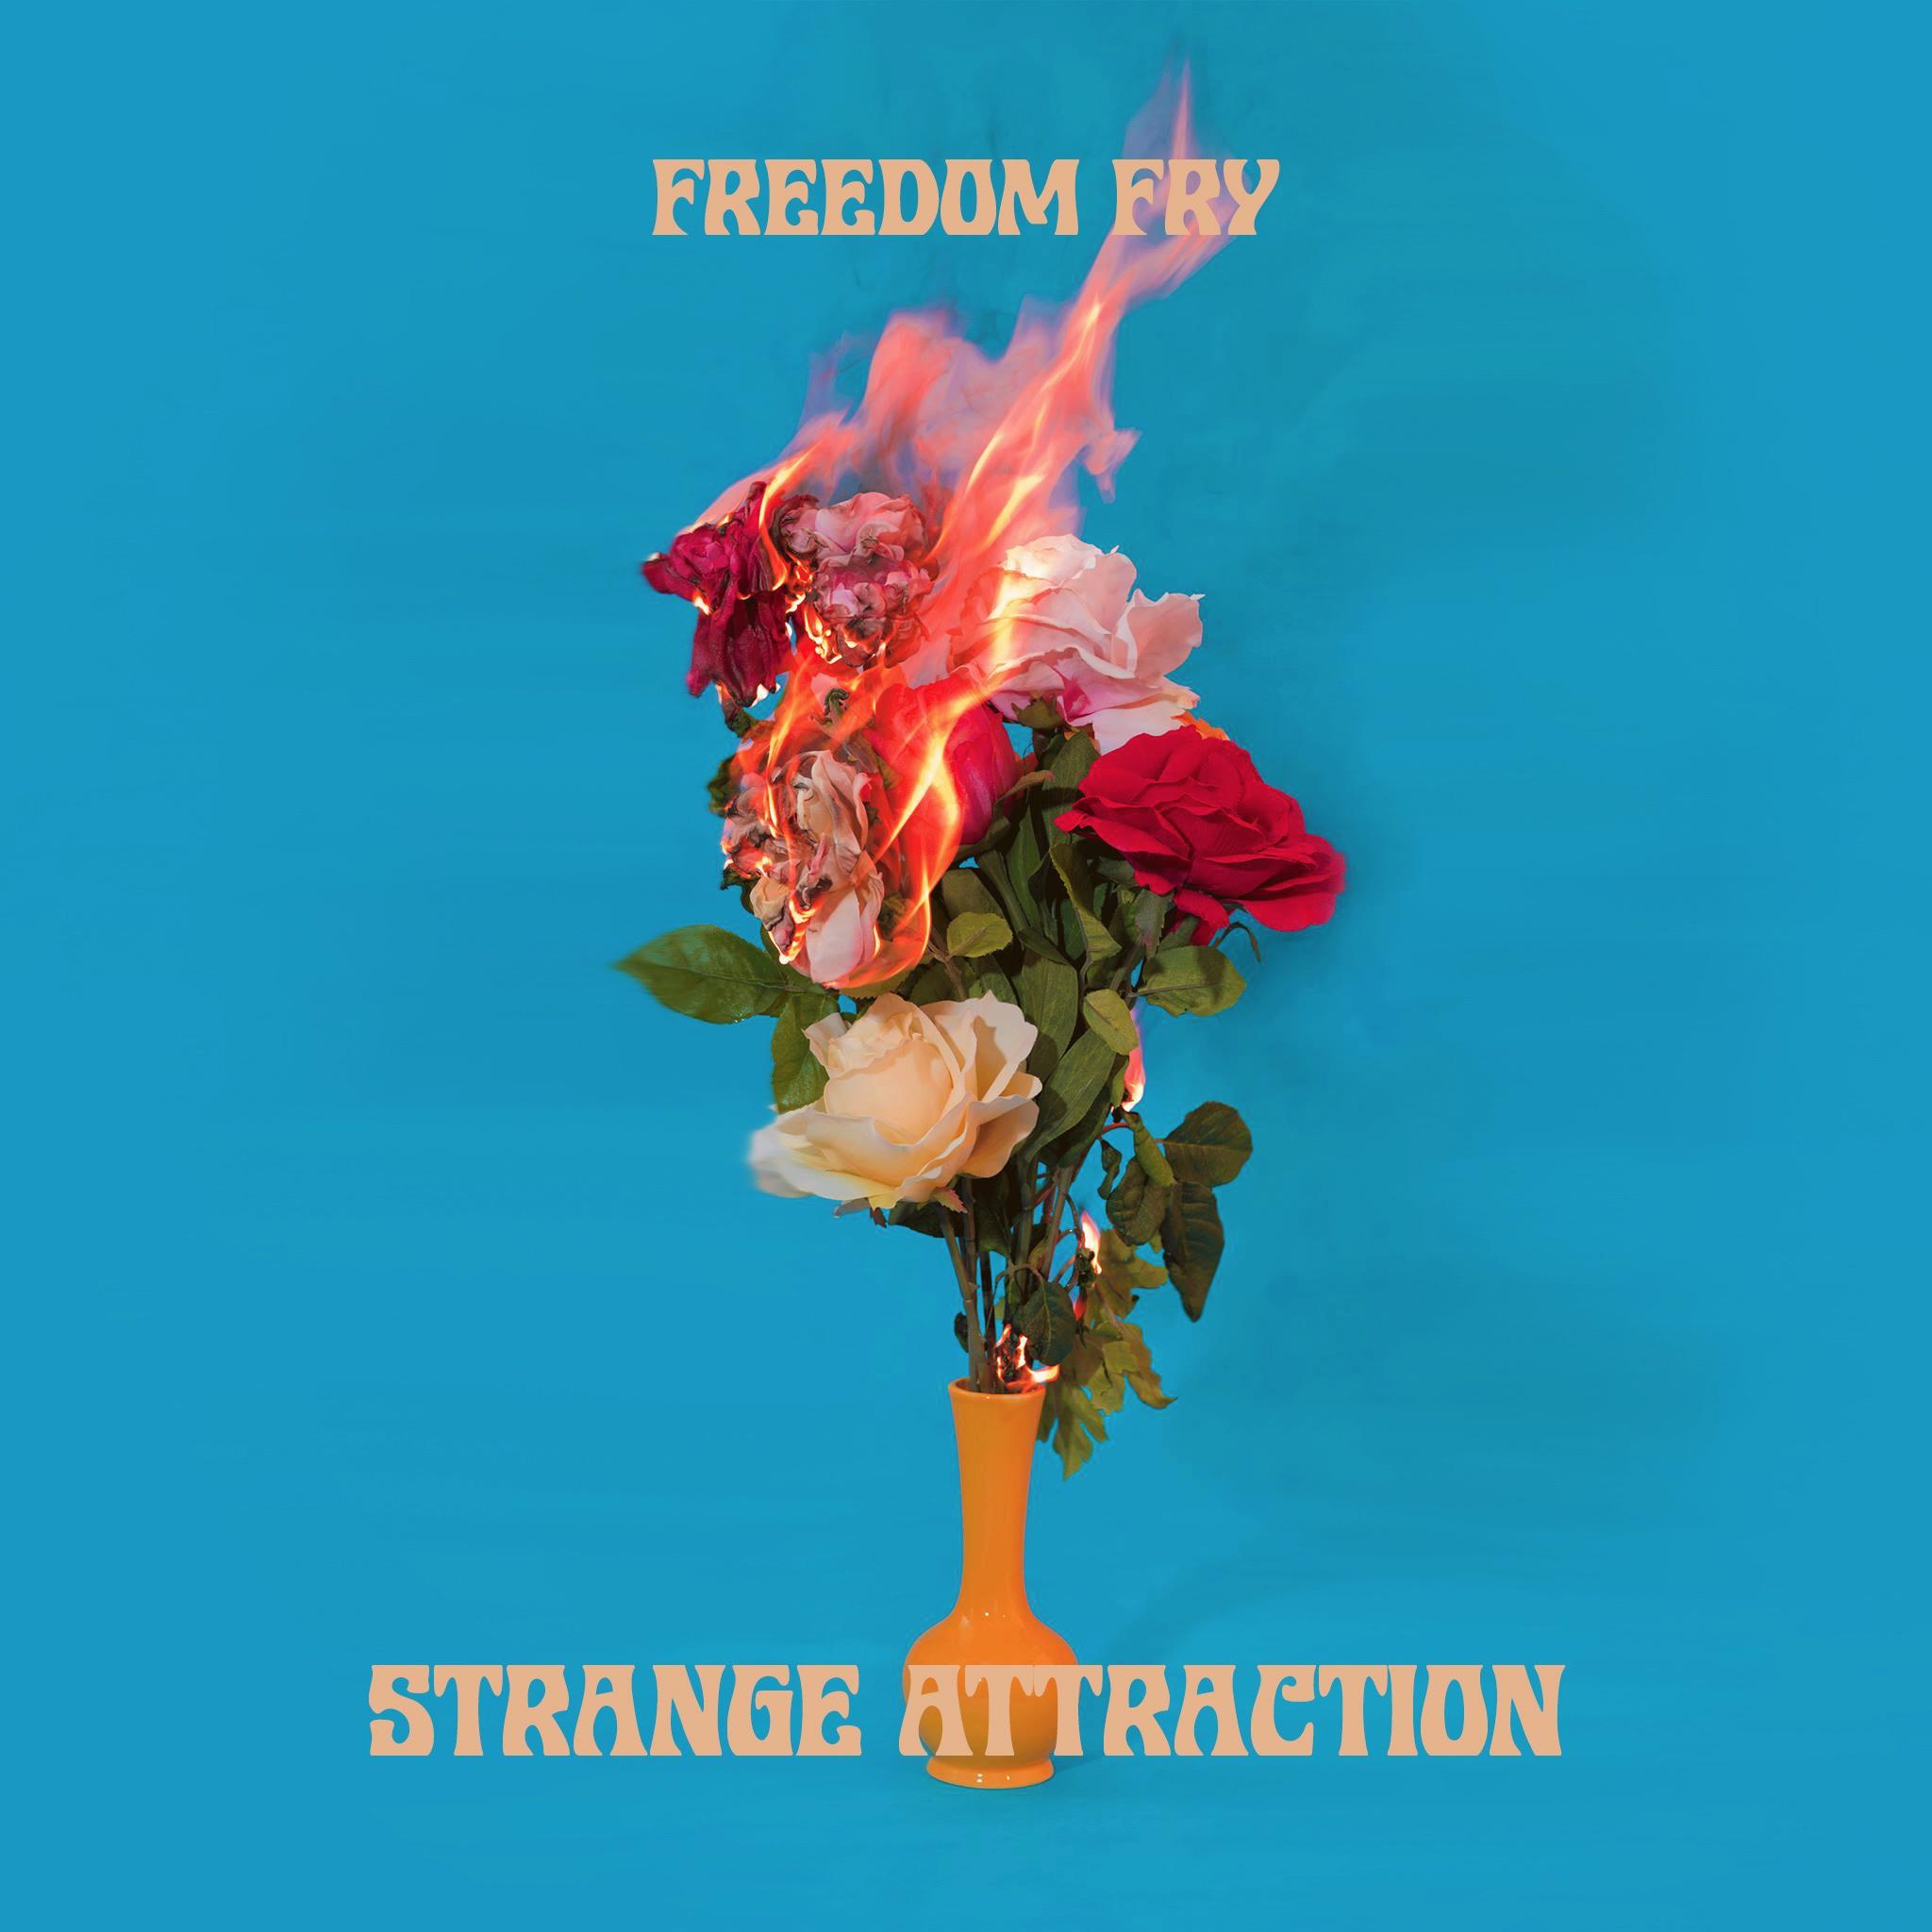 freedom fry strange attraction